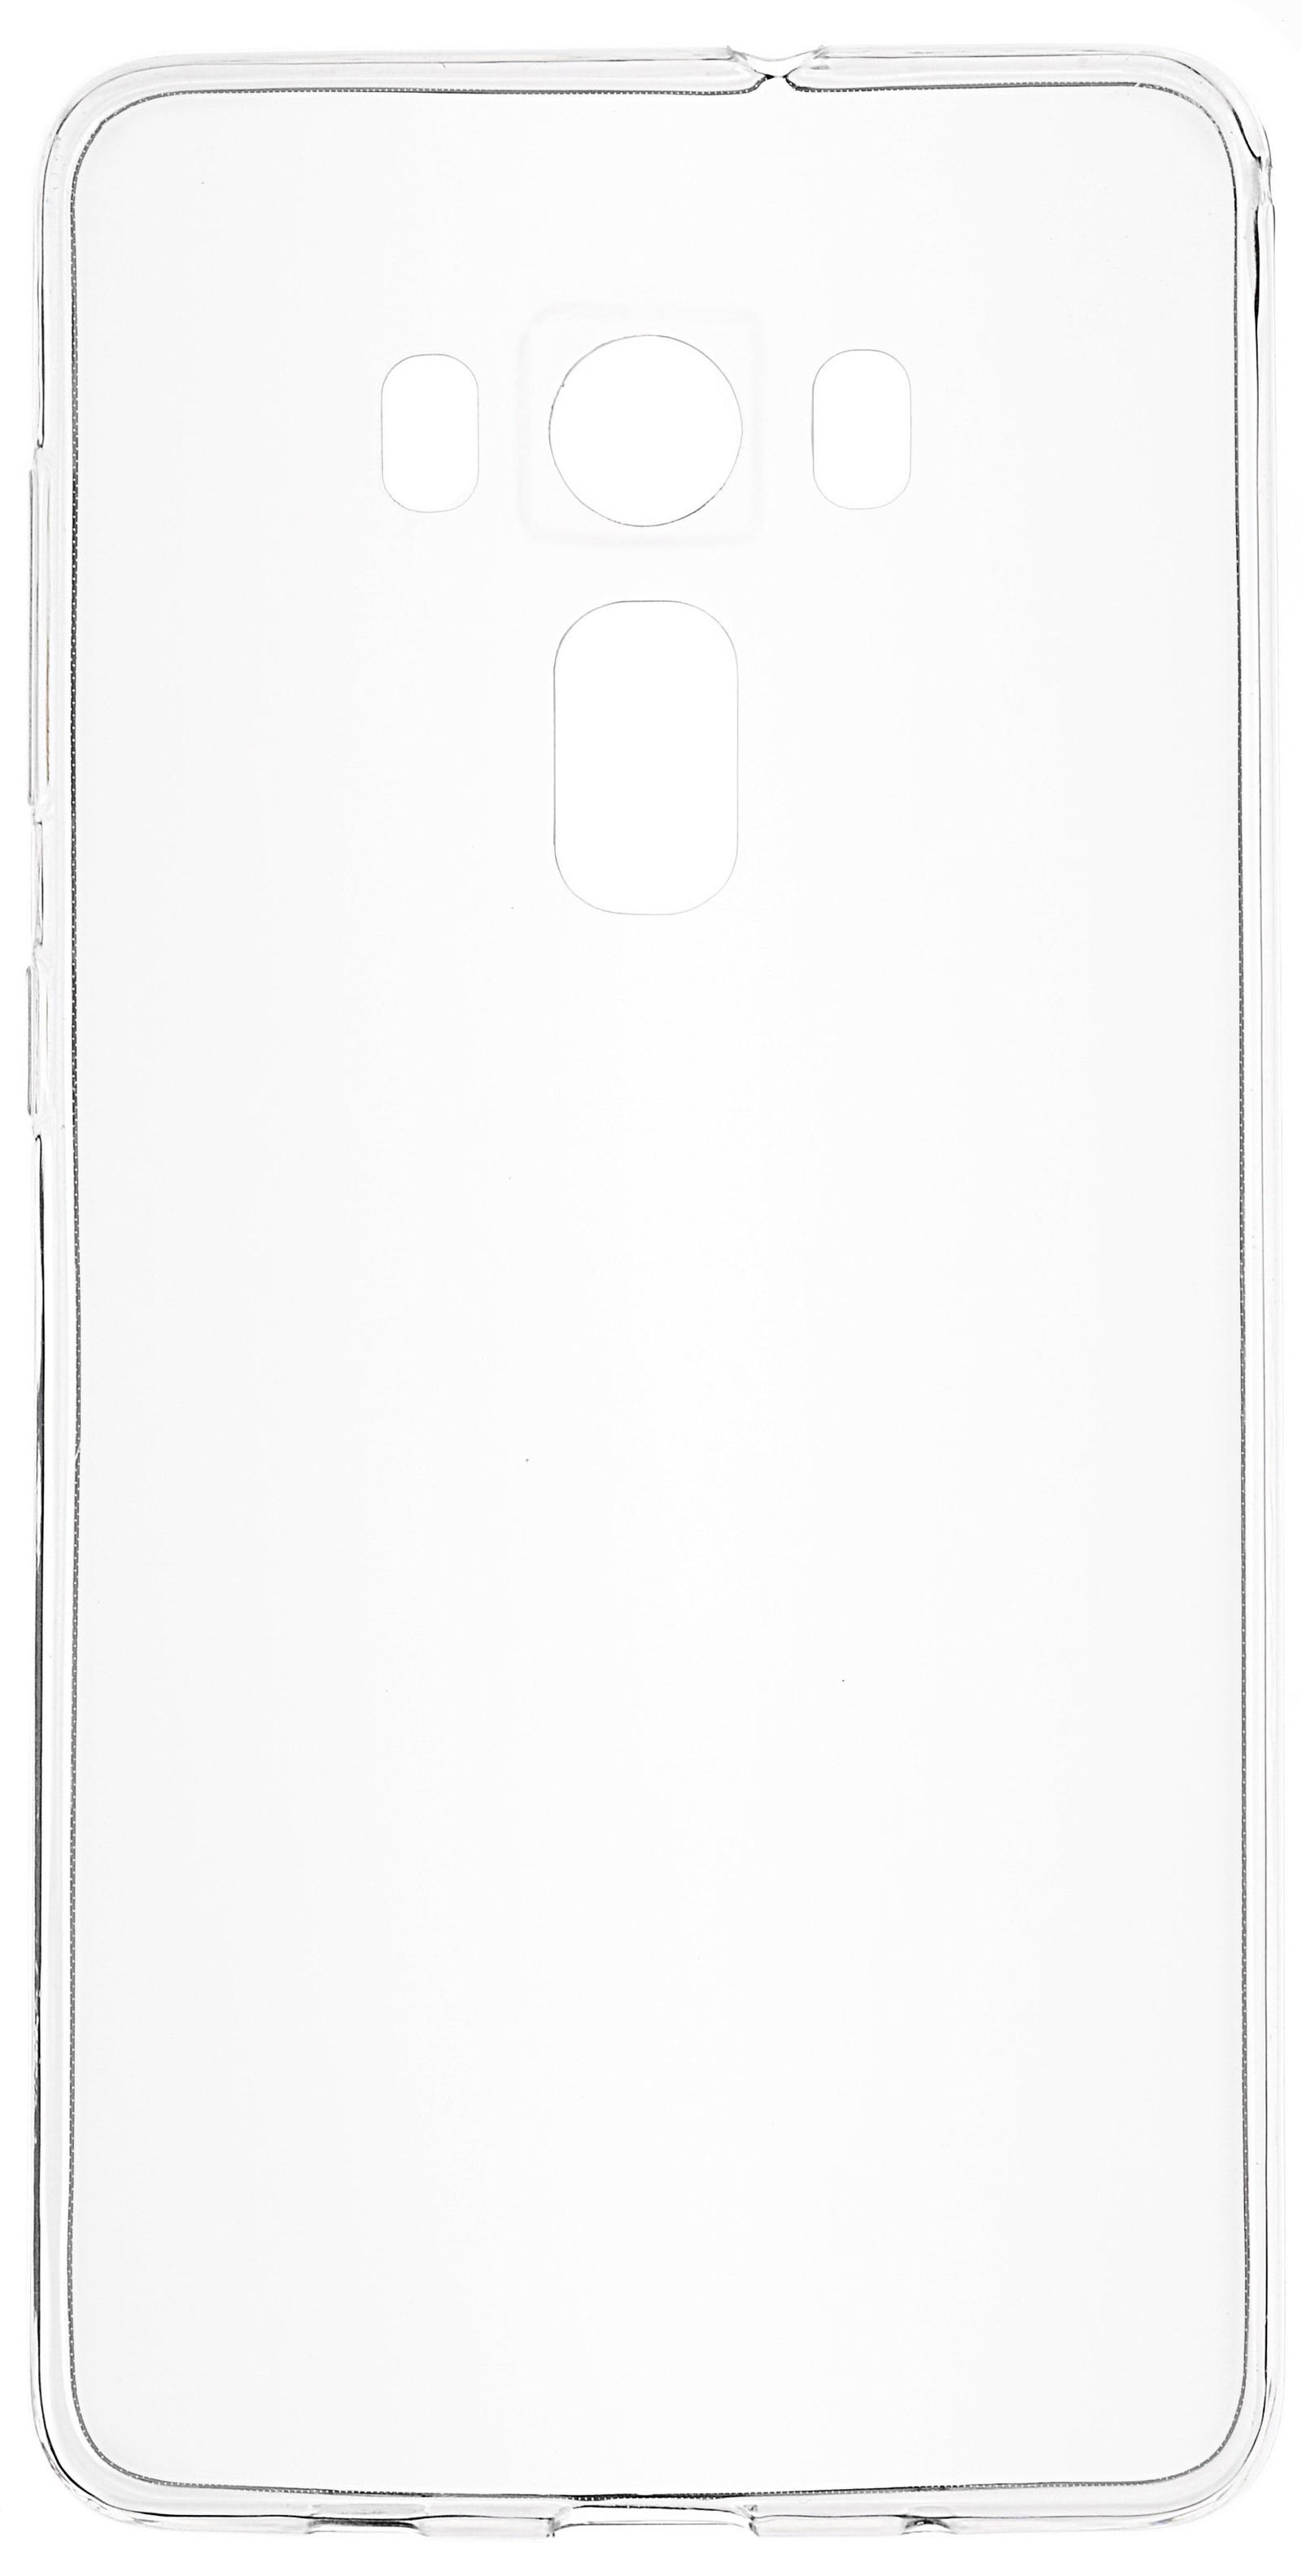 Чехол для сотового телефона skinBOX Slim Silicone, 4630042524835, прозрачный чехол для xiaomi redmi pro skinbox 4people slim silicone case прозрачный